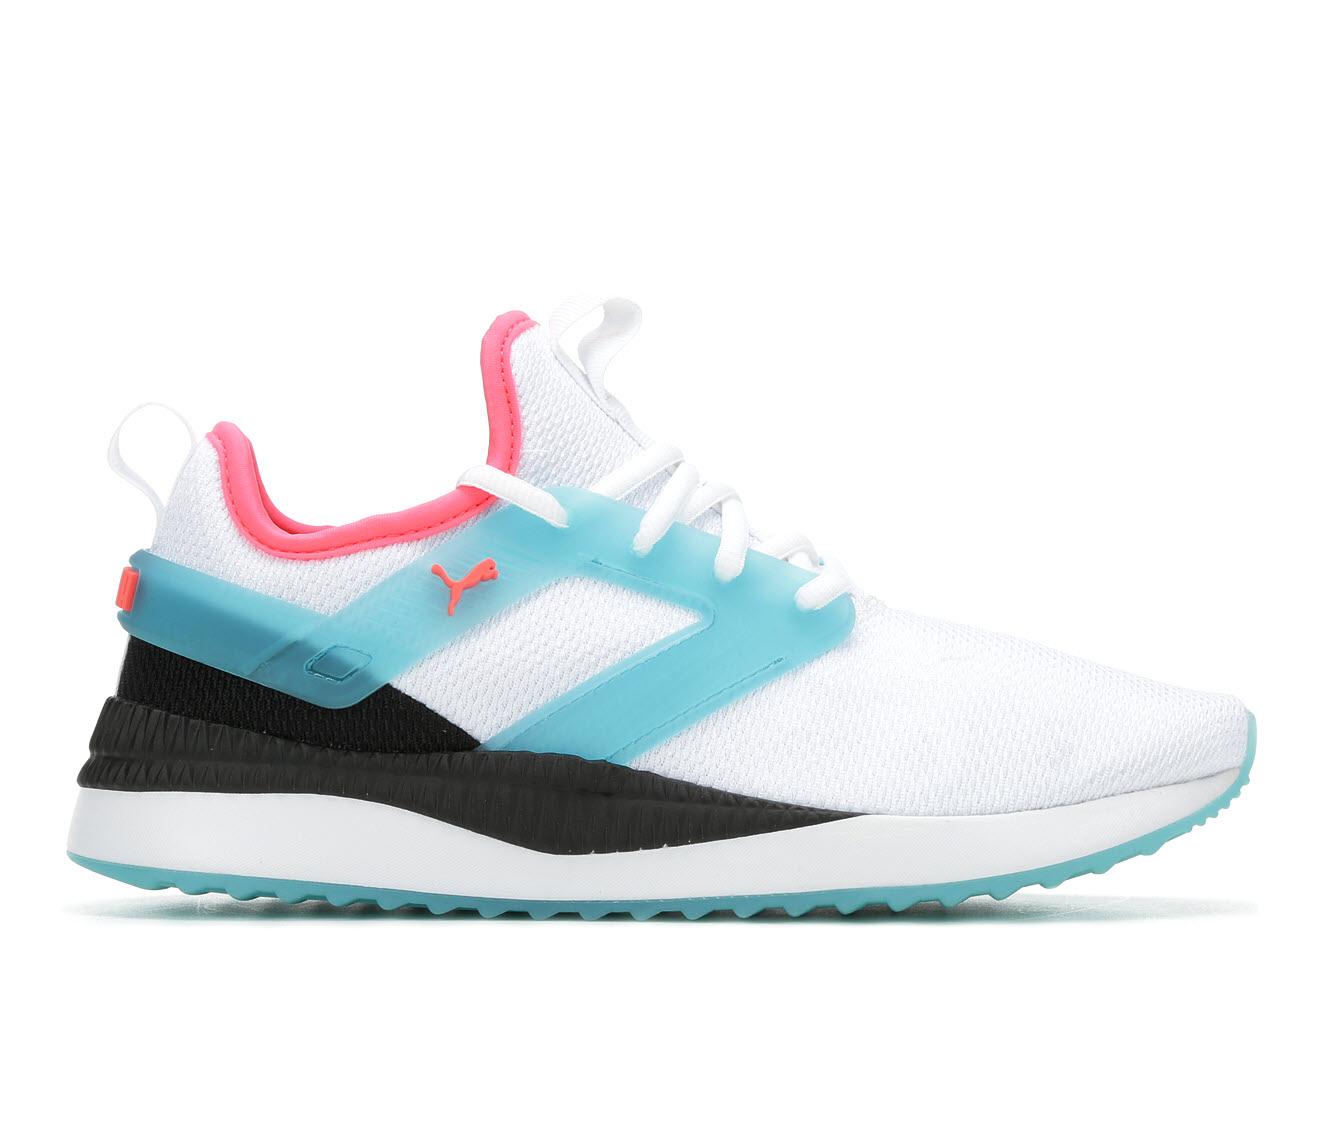 Puma Pacer Next Translucent Women's Athletic Shoe (White)